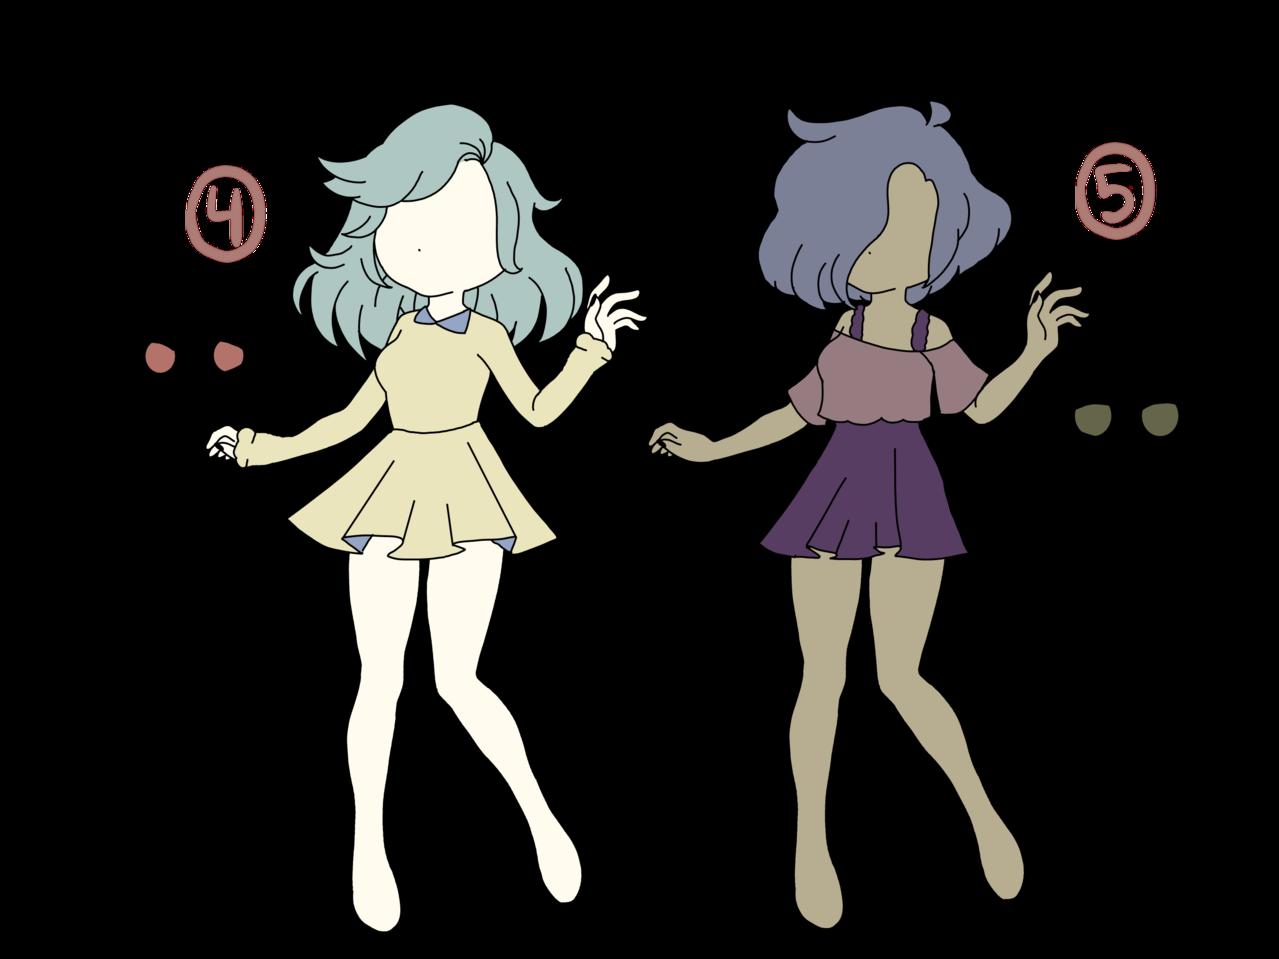 Adopts (read des)  Illust of Pastel//Virgil•Mode Adoptable medibang Adopts DTA